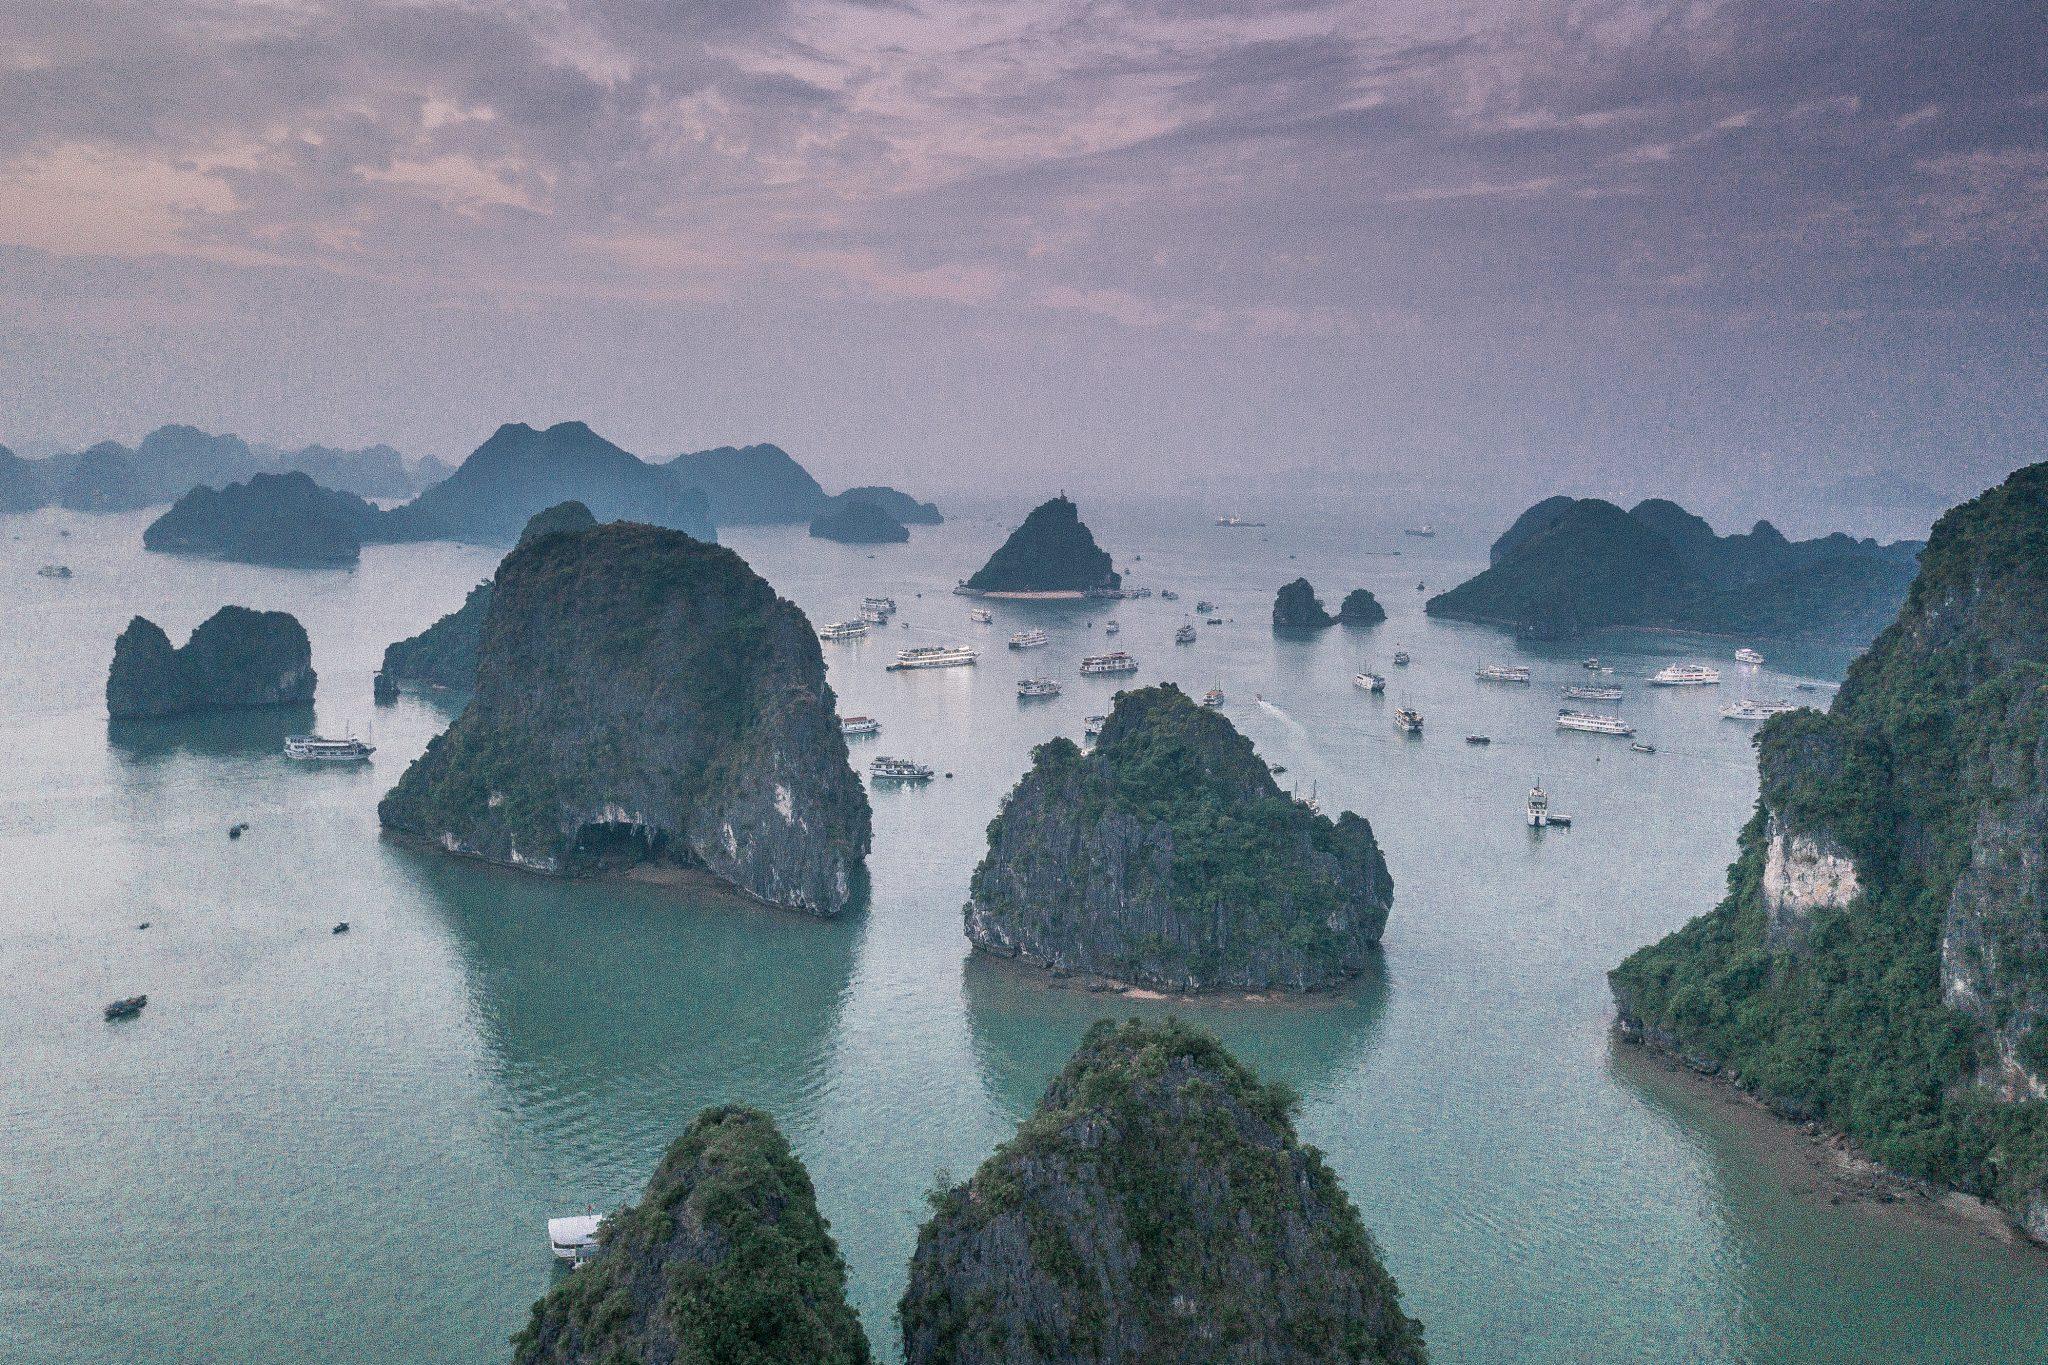 Halong Bay Cruise Guide